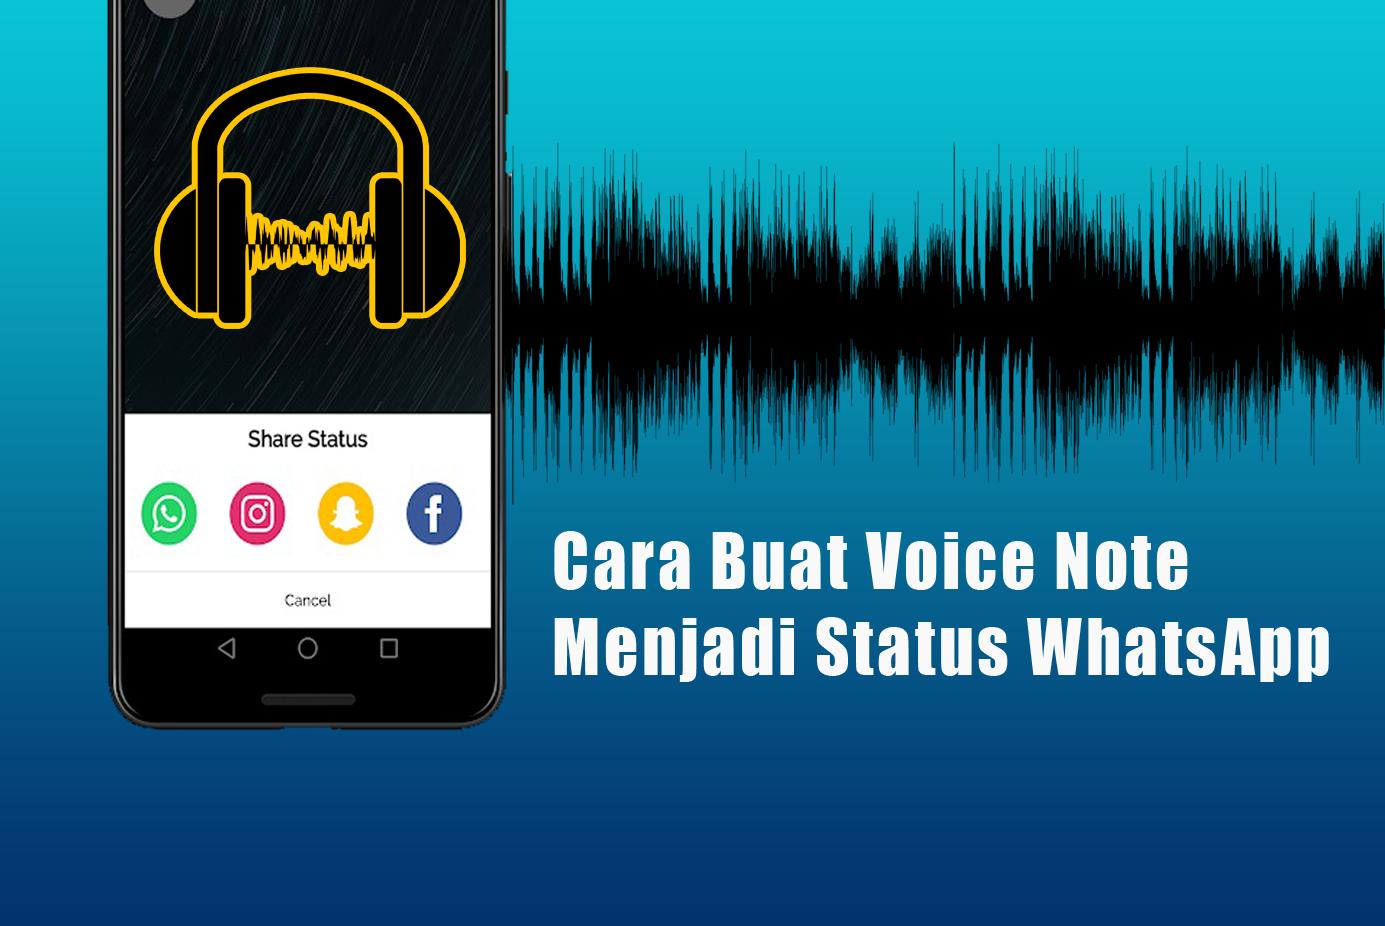 Cara Buat Voice Note Menjadi Status WhatsApp